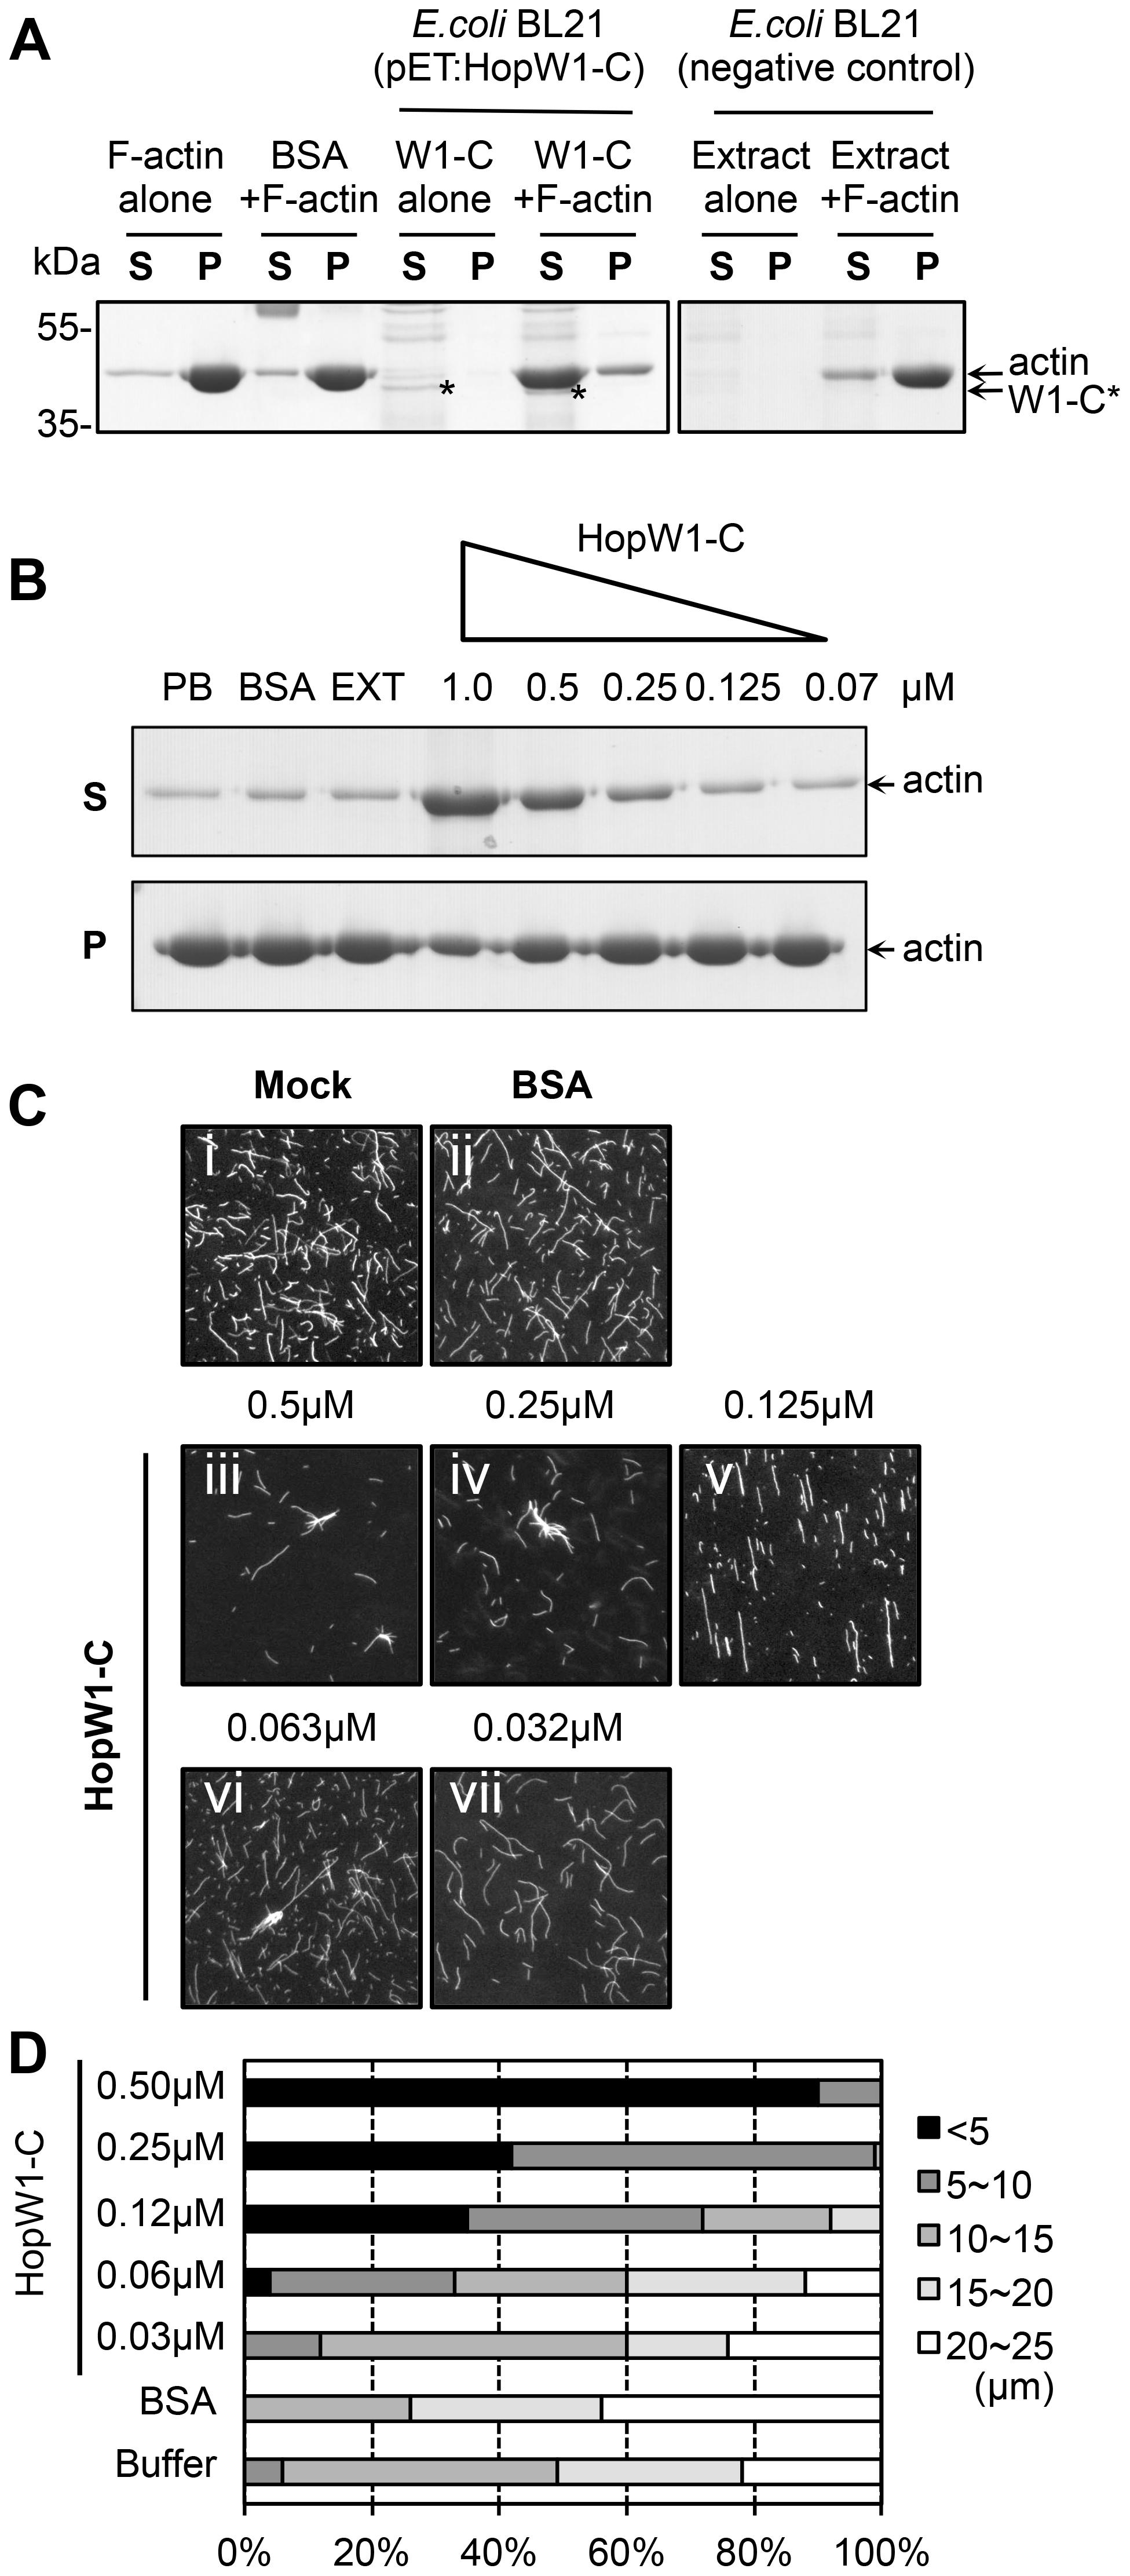 HopW1-C disrupts F-actin <i>in vitro</i>.